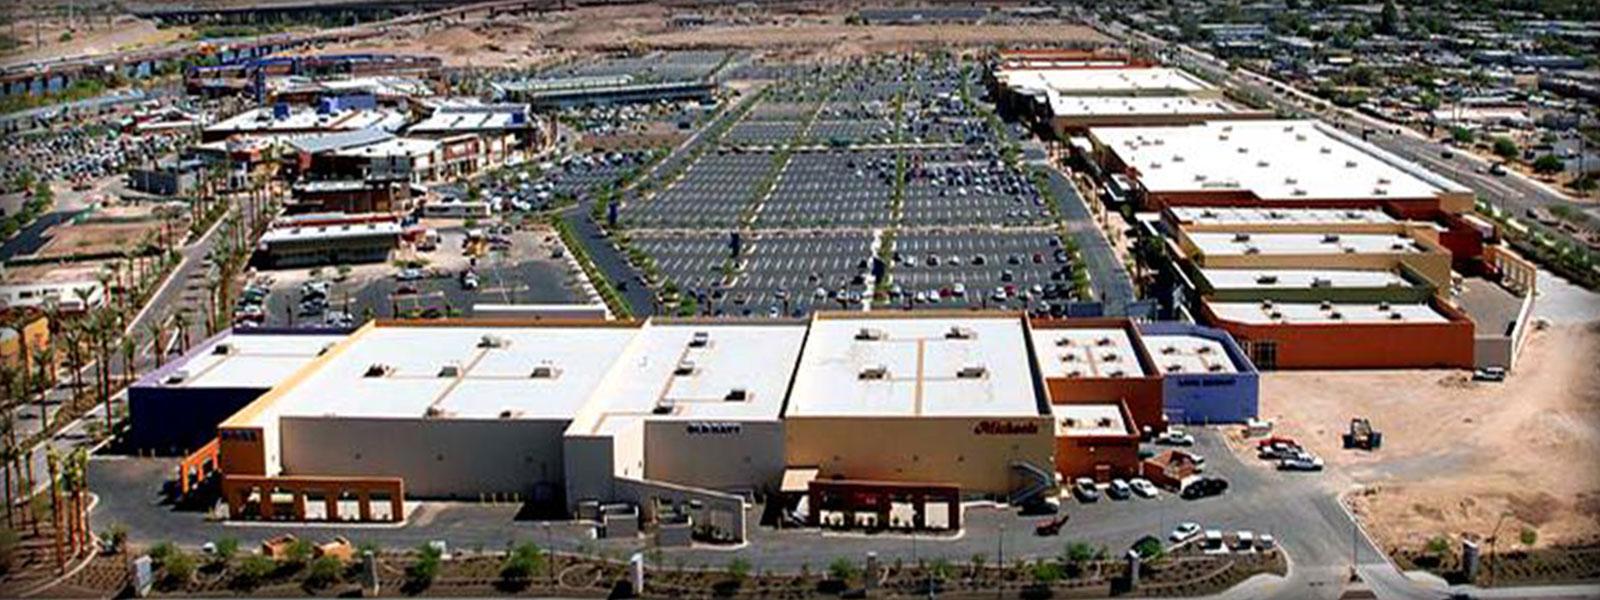 Commercial Progressive Roofing